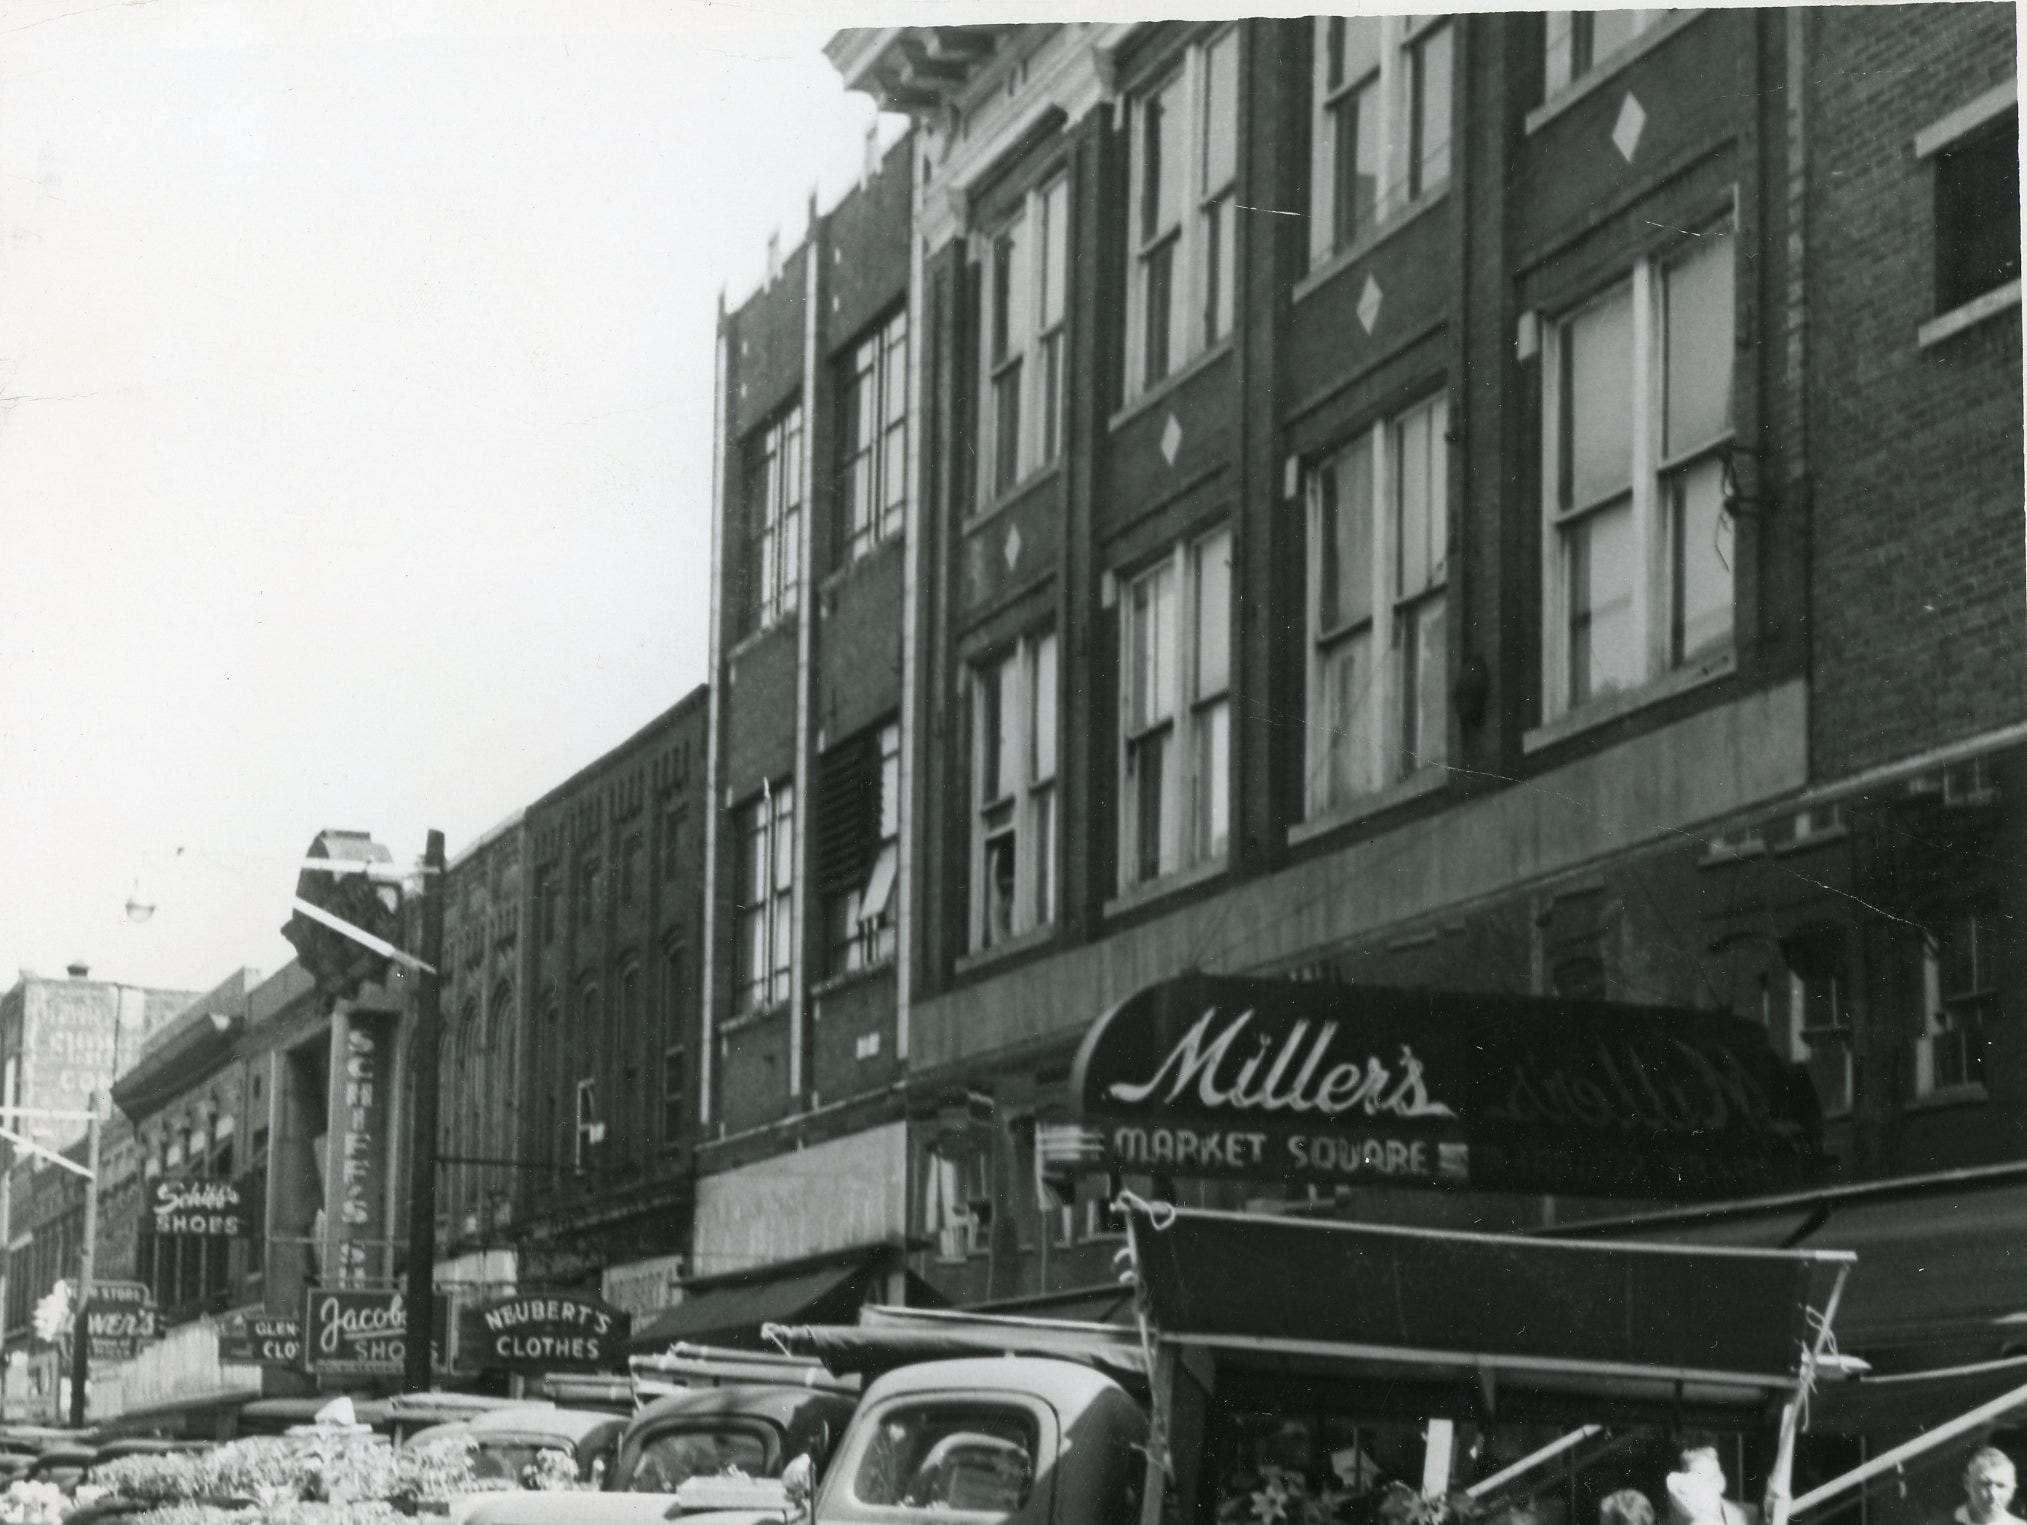 Market Square Mall, April, 1960.